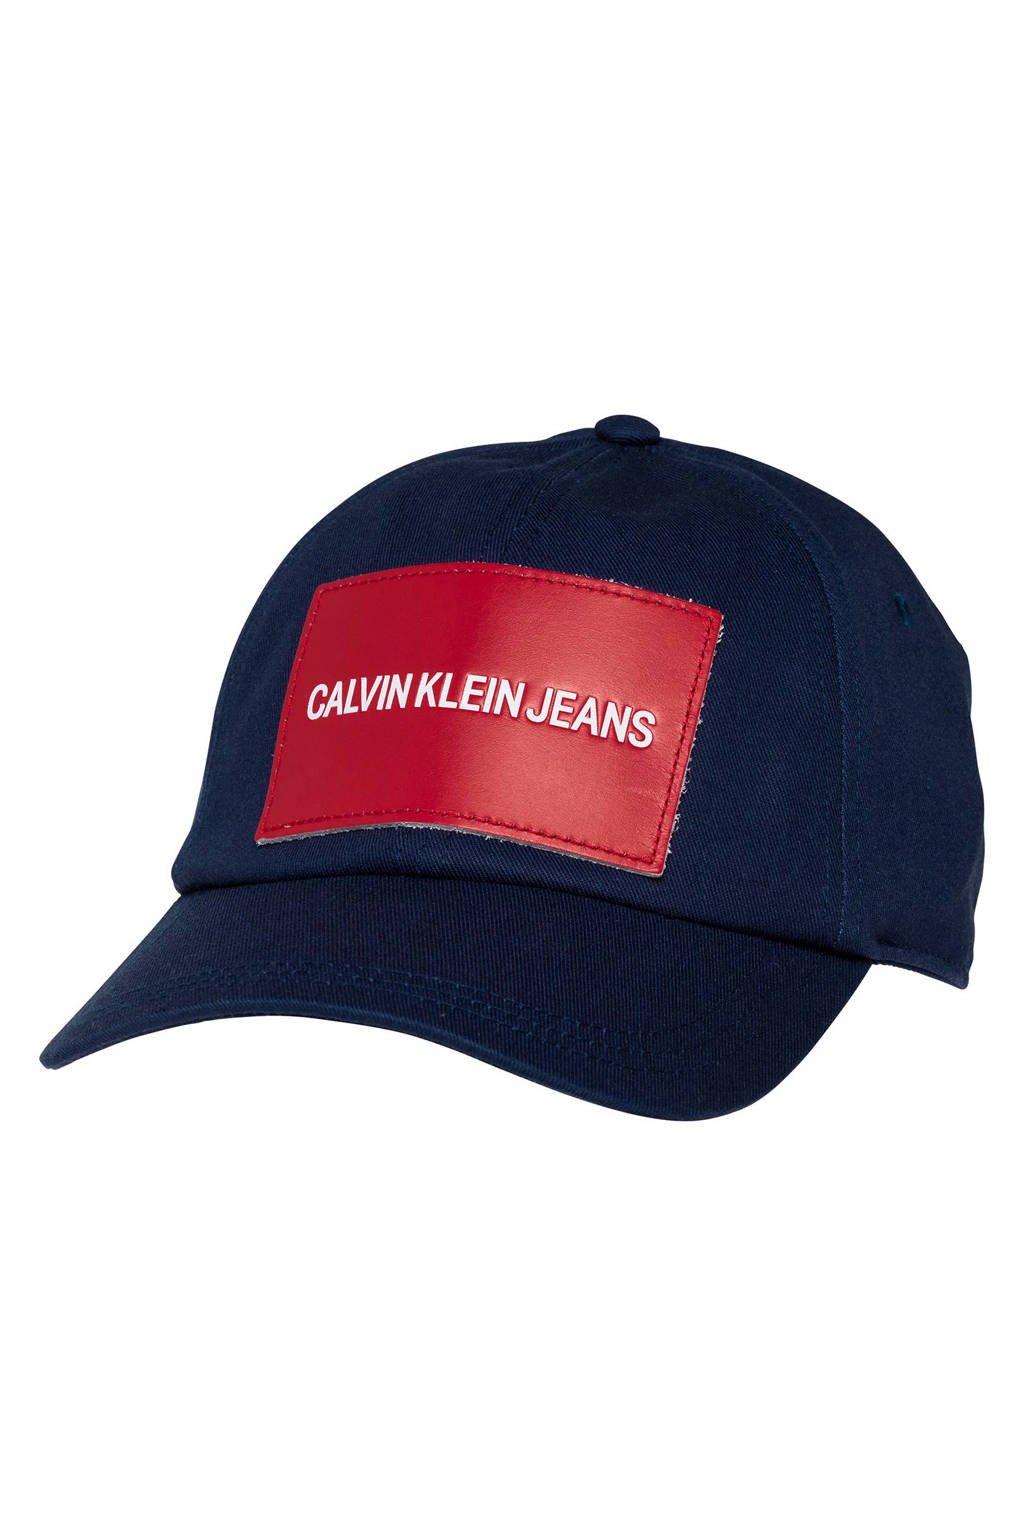 Calvin Klein Jeans pet, Blauw/rood